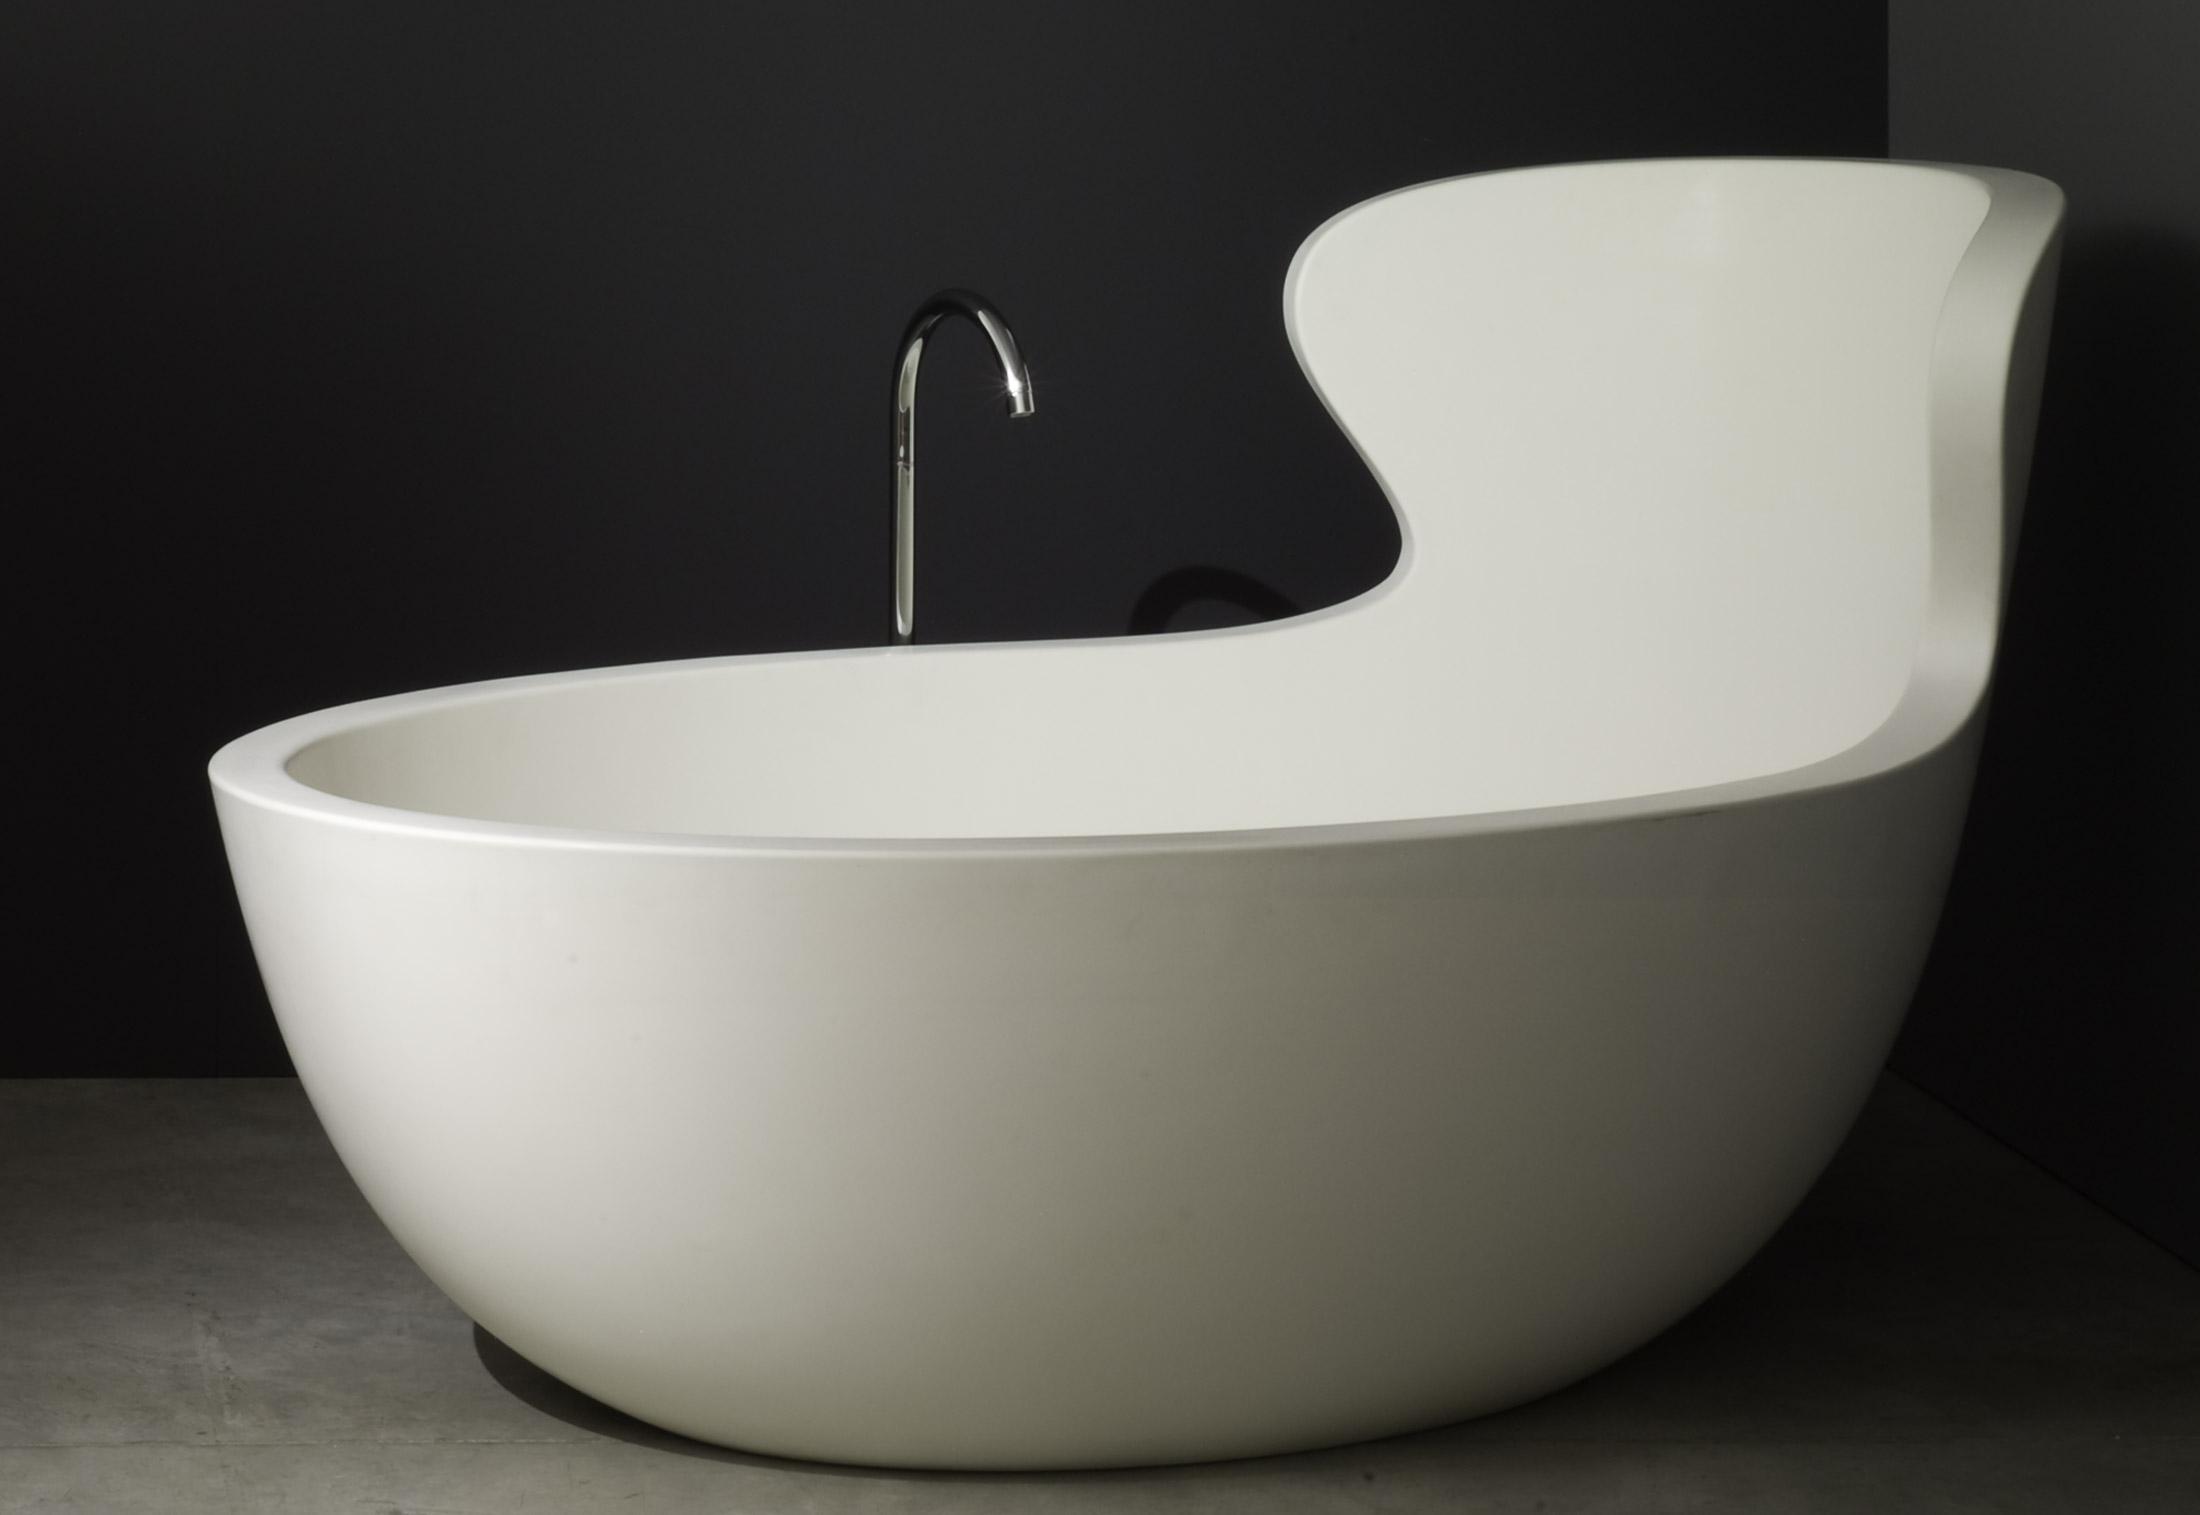 ARNE bathtub by Rapsel   STYLEPARK